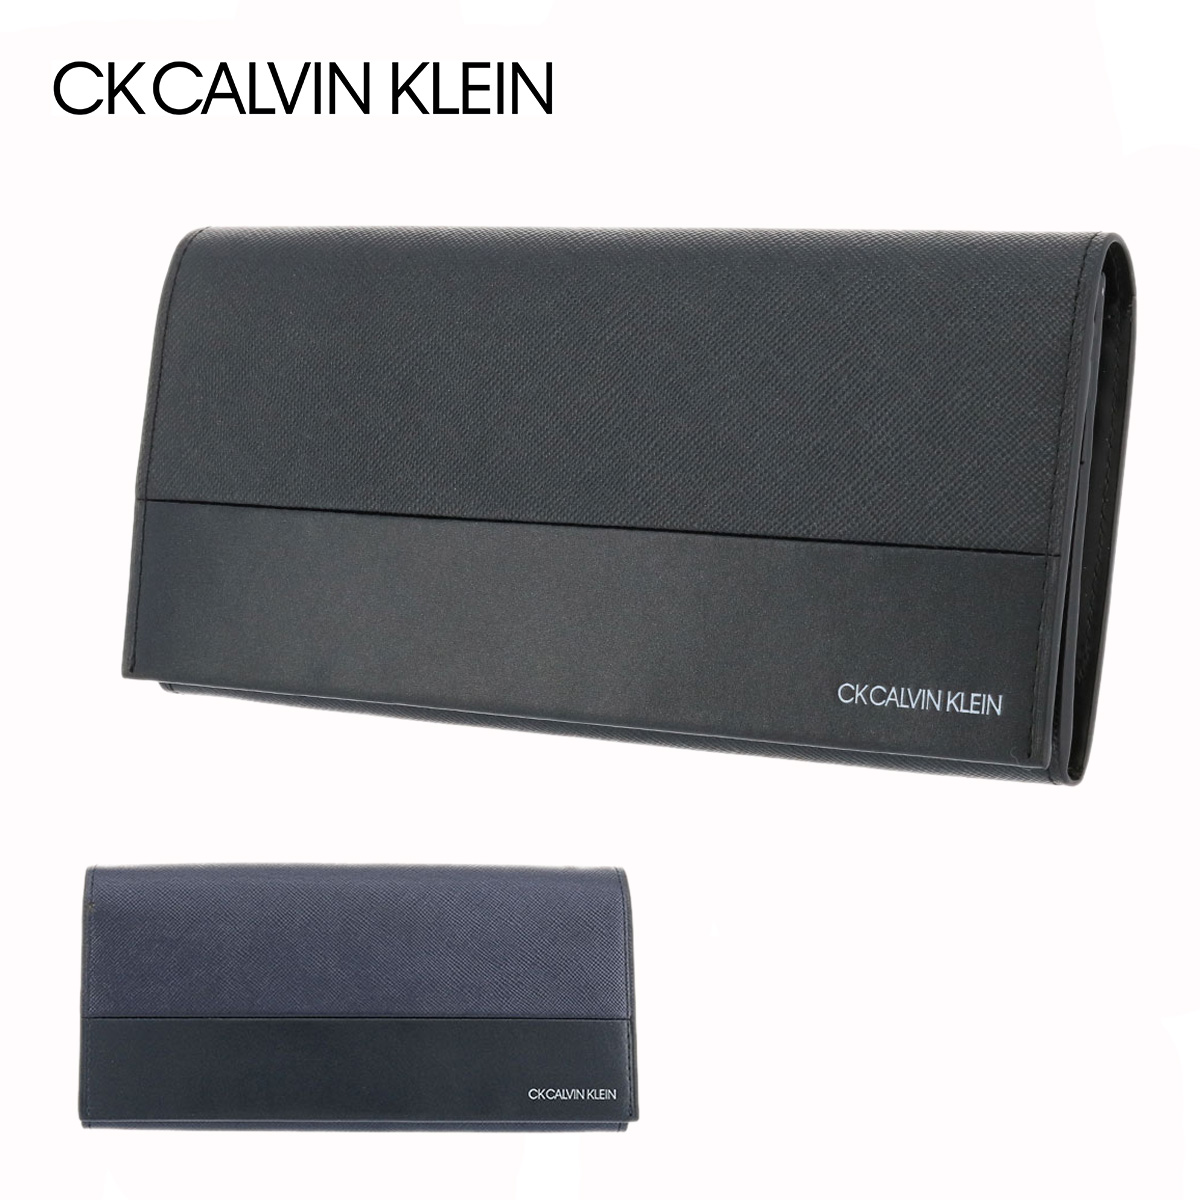 95c3216e8e6c シーケー カルバンクライン 長財布 アロイII メンズ 822655 CK CALVIN KLEIN | 本革 レザー